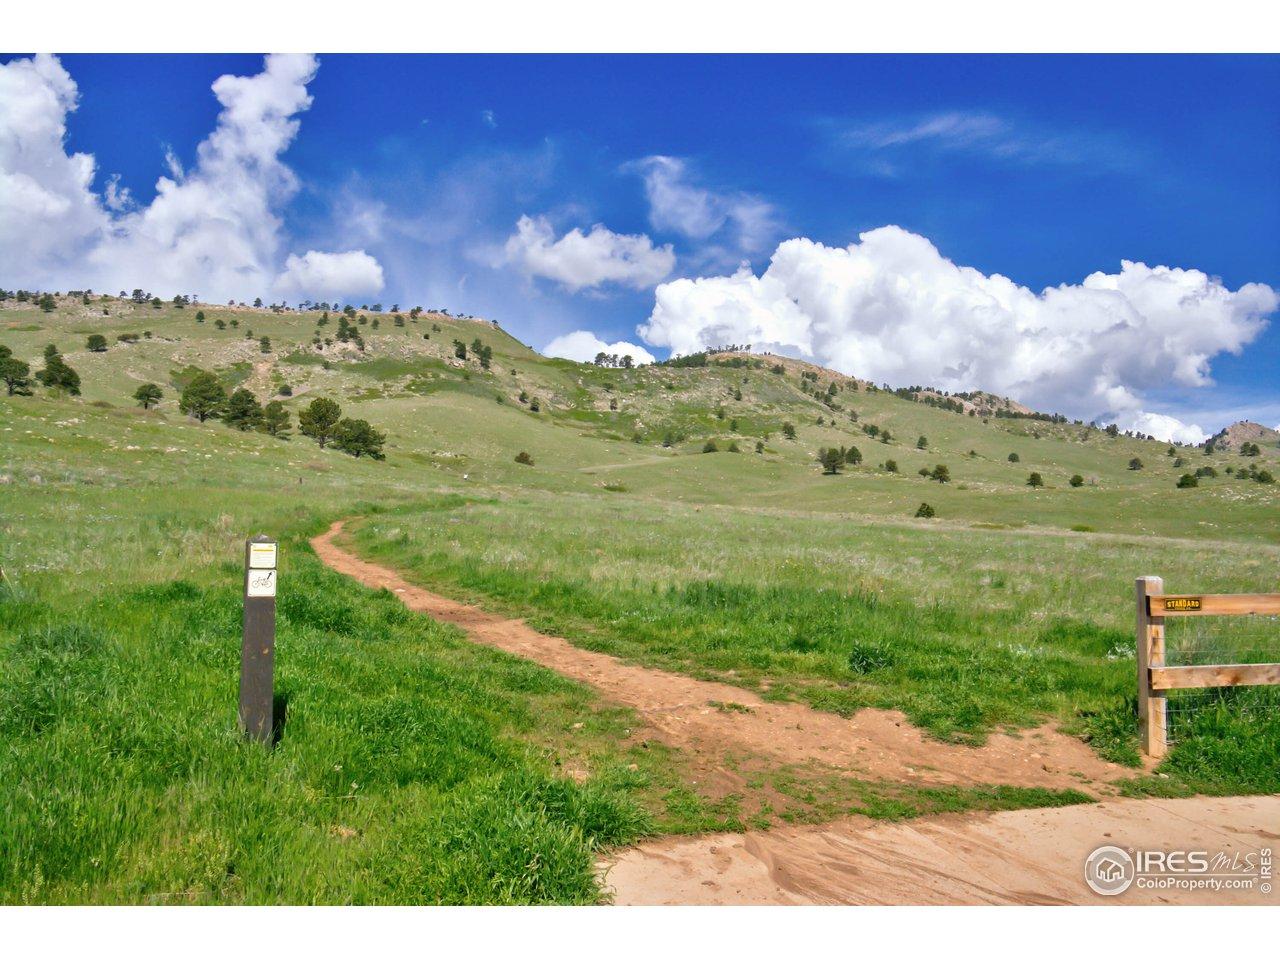 Neighborhood Hiking/Biking Trails